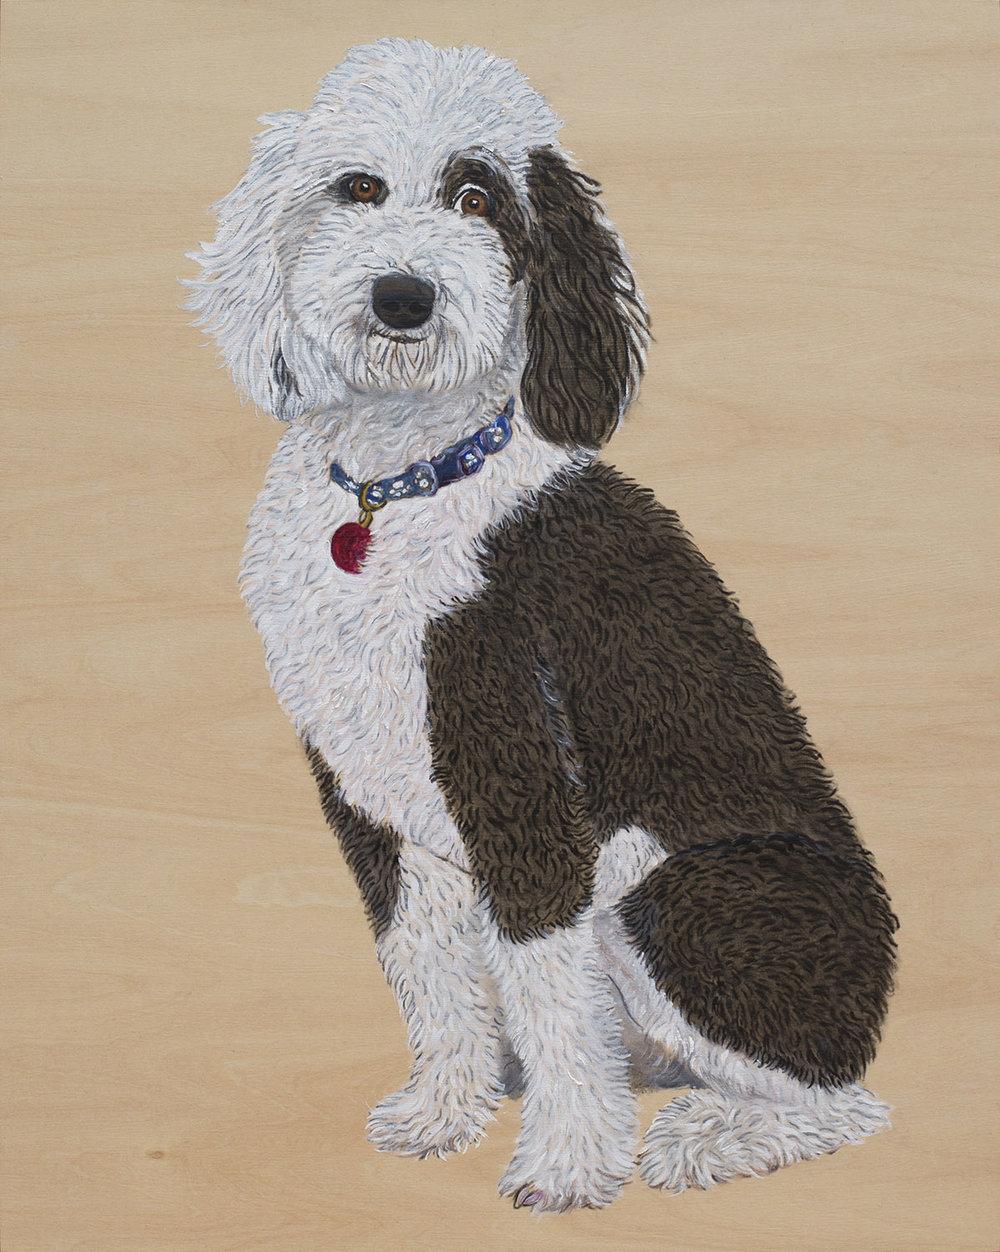 dog-portrait-on-wood-malayka-gormally.jpg